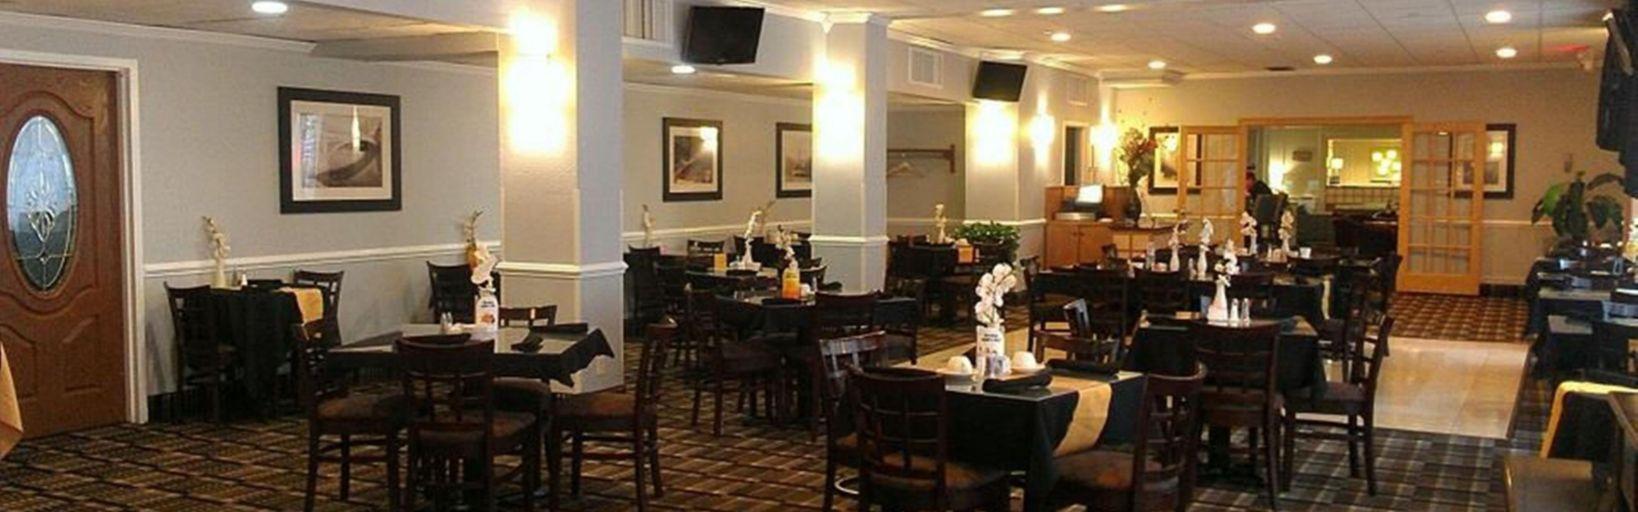 Restaurants Near Holiday Inn Gw Bridge Fort Lee Nyc Area